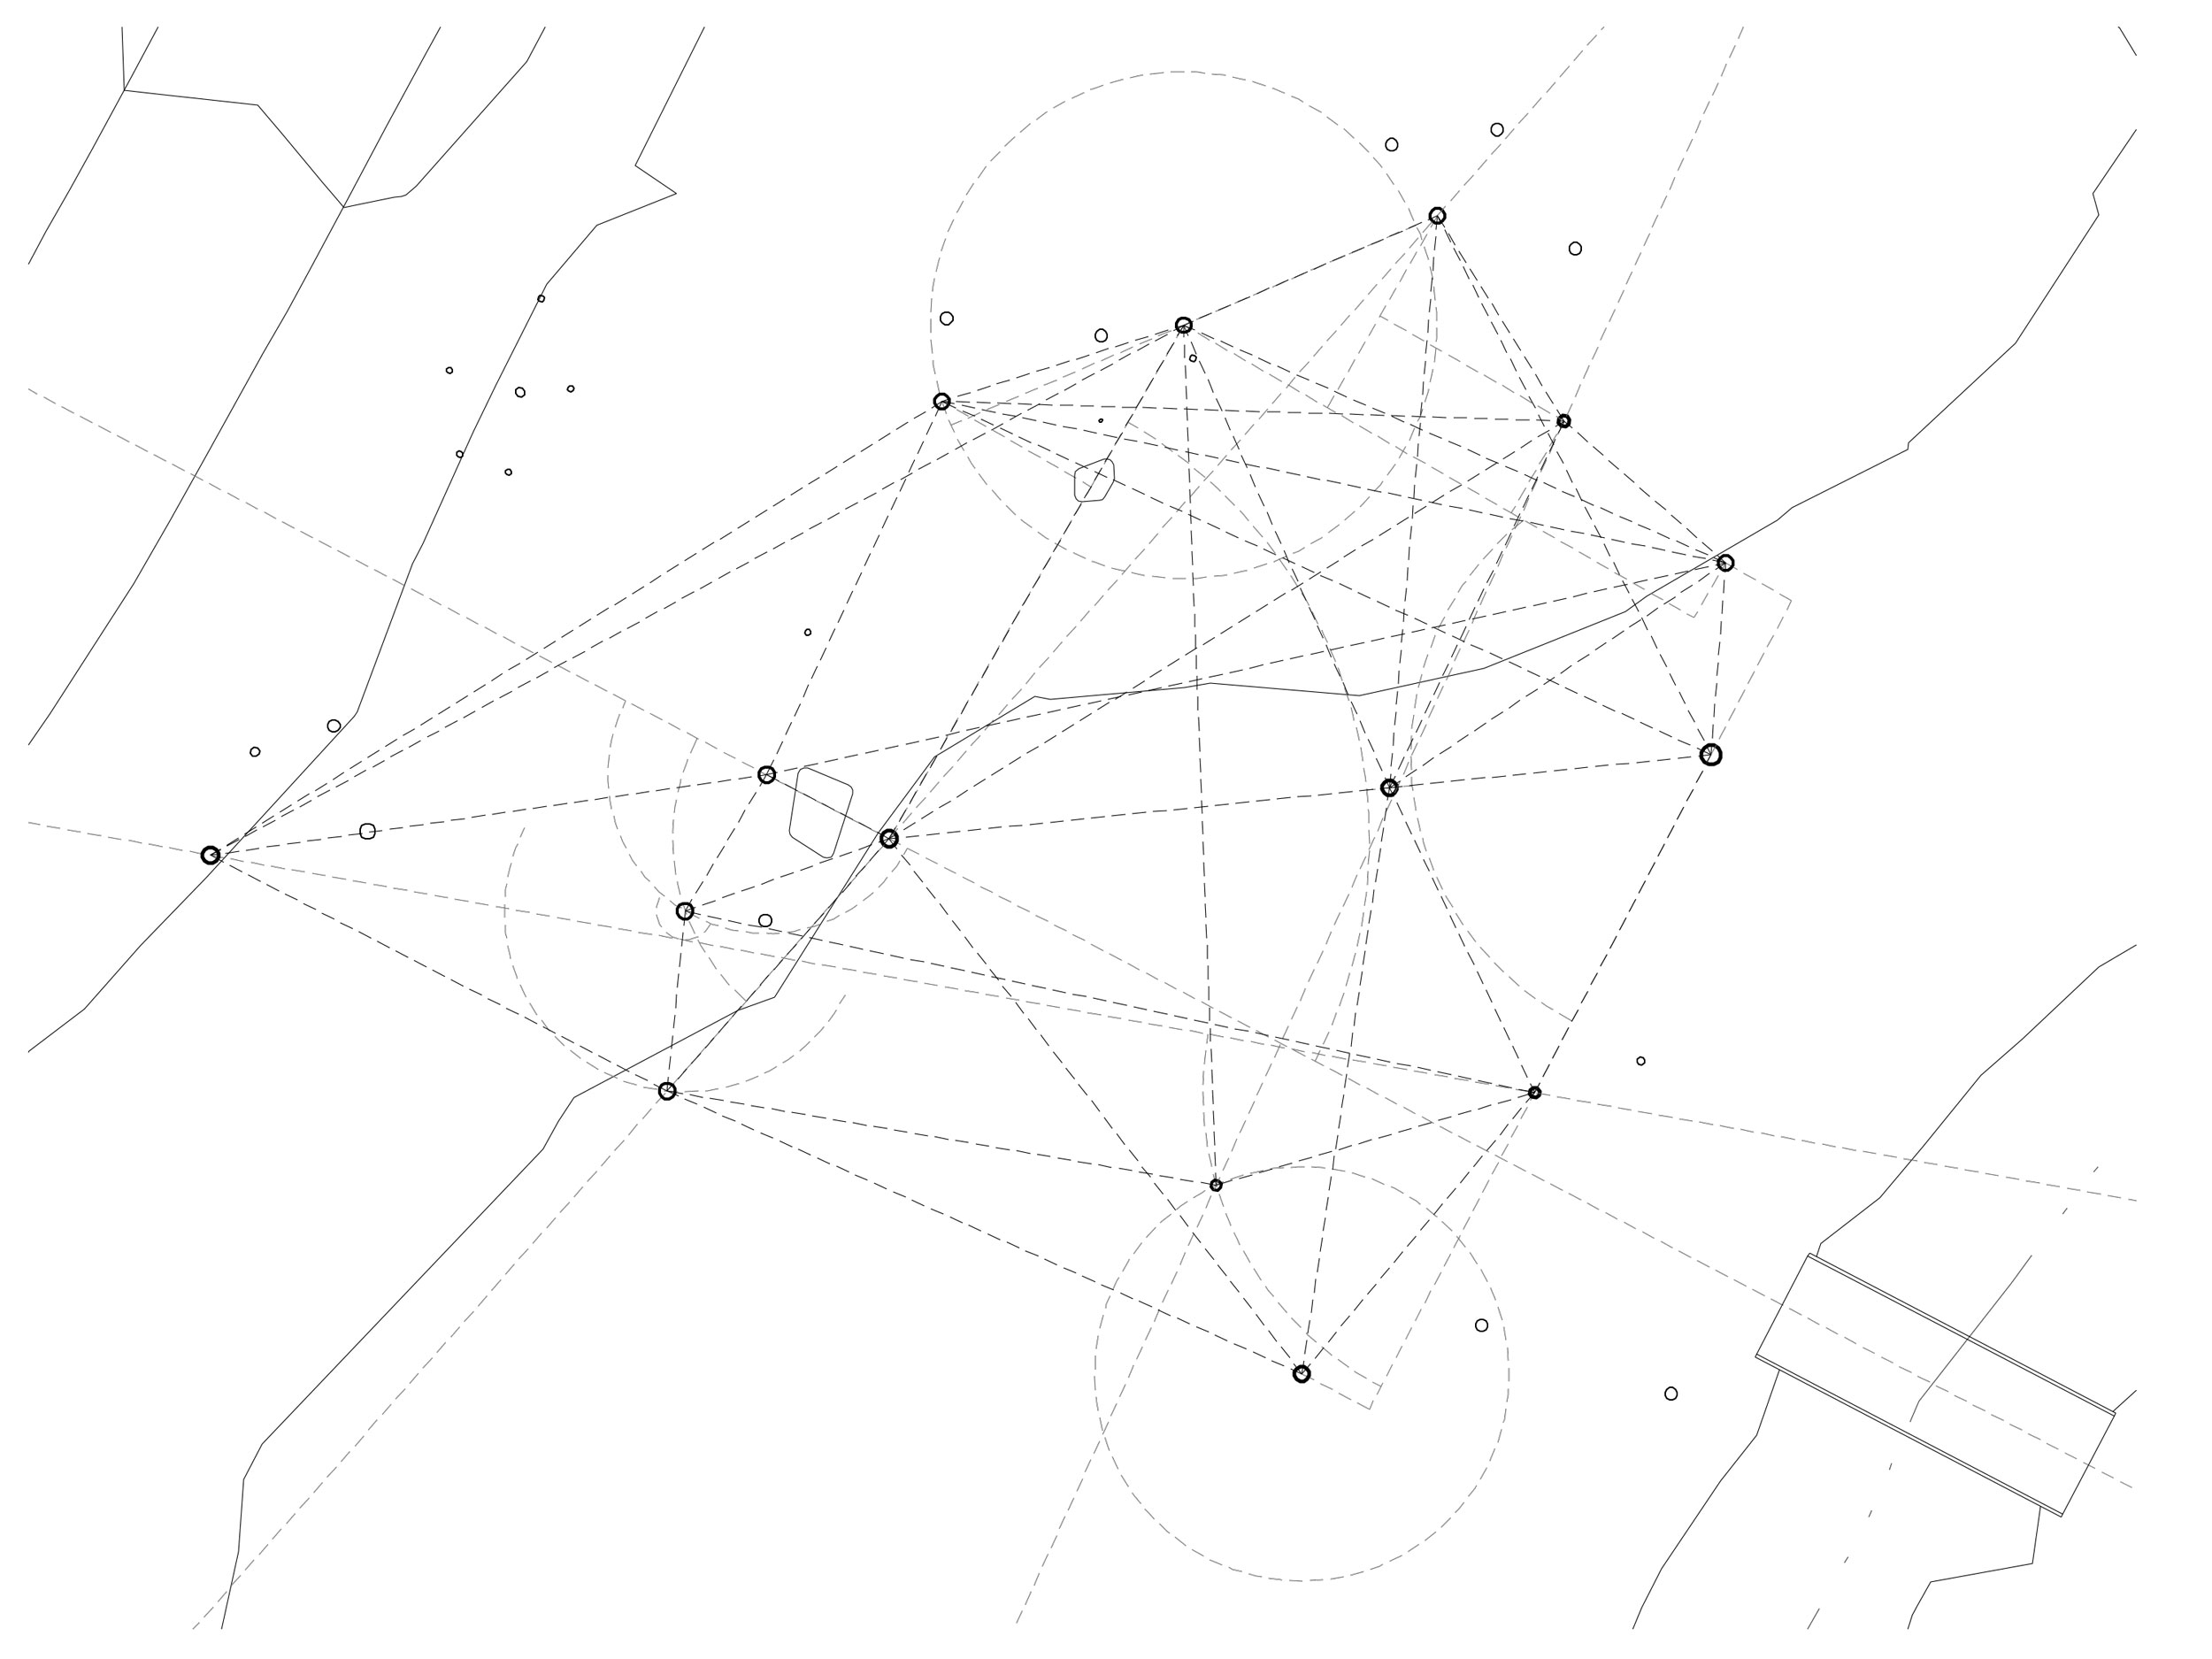 dtc-web_toaconstellation-process_drawing02.jpg